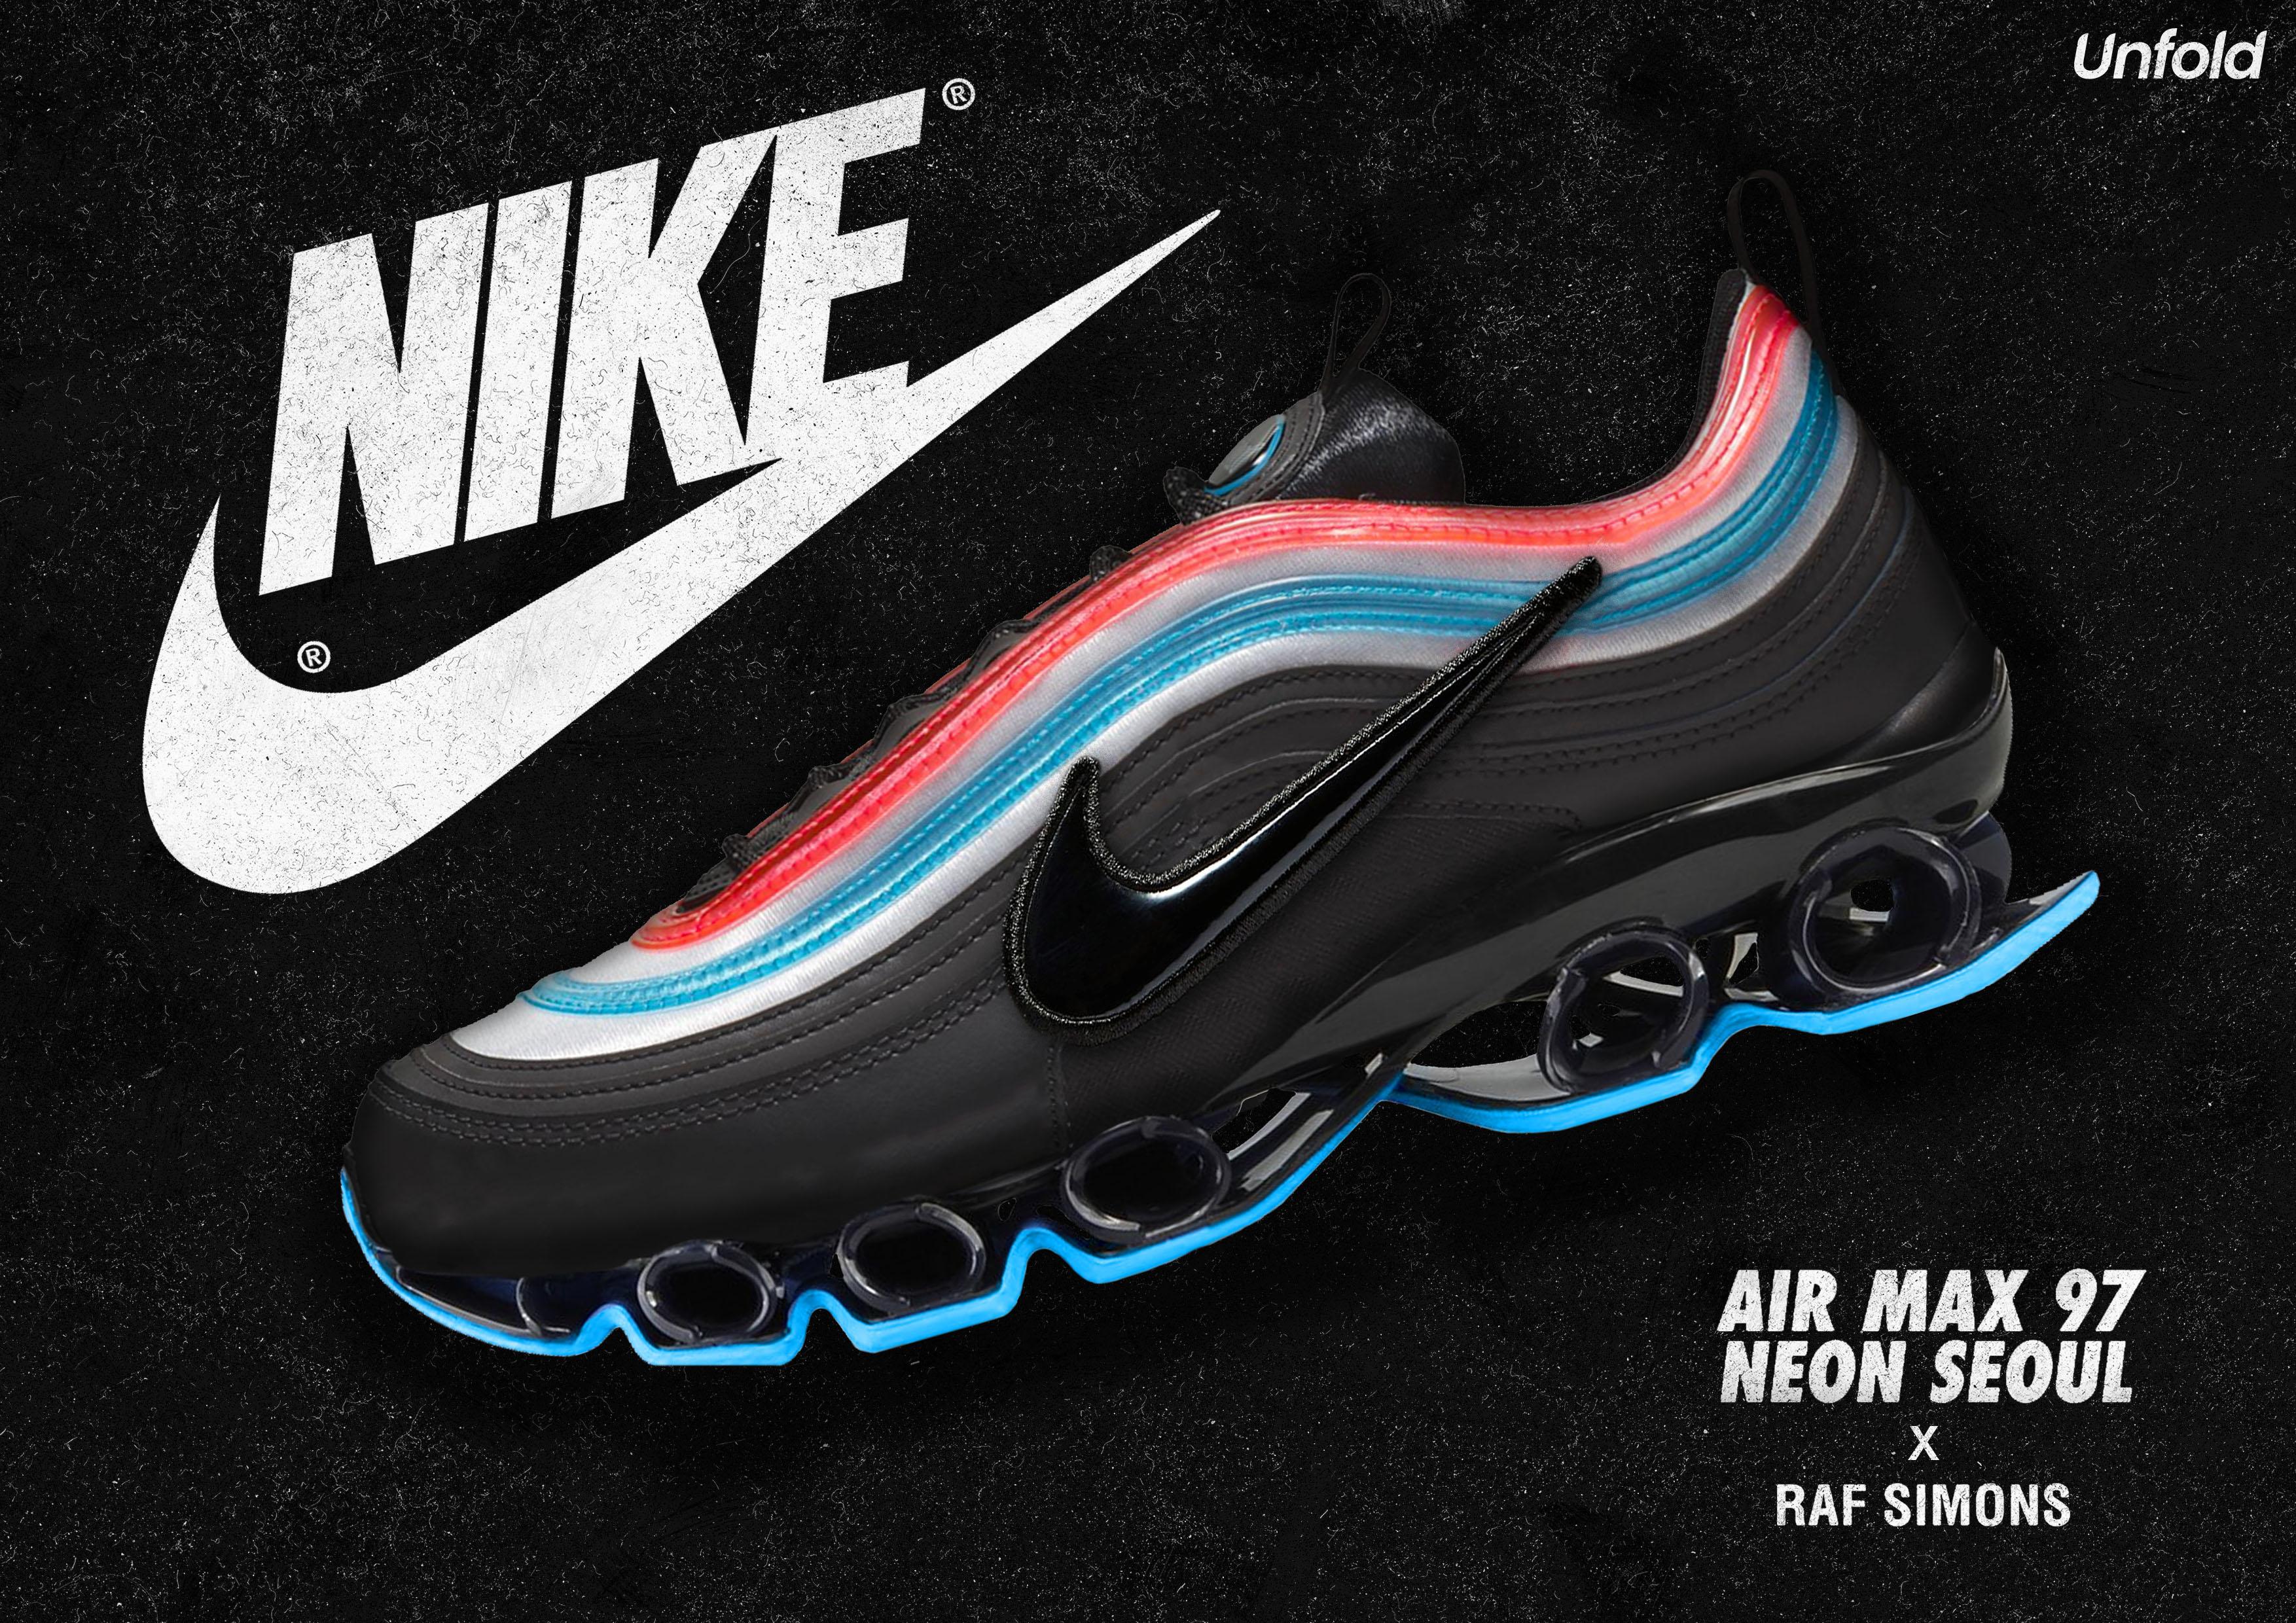 separation shoes 5b831 7cb7f Neon Seoul Nike Air Max 97 X Raf Simons on Behance